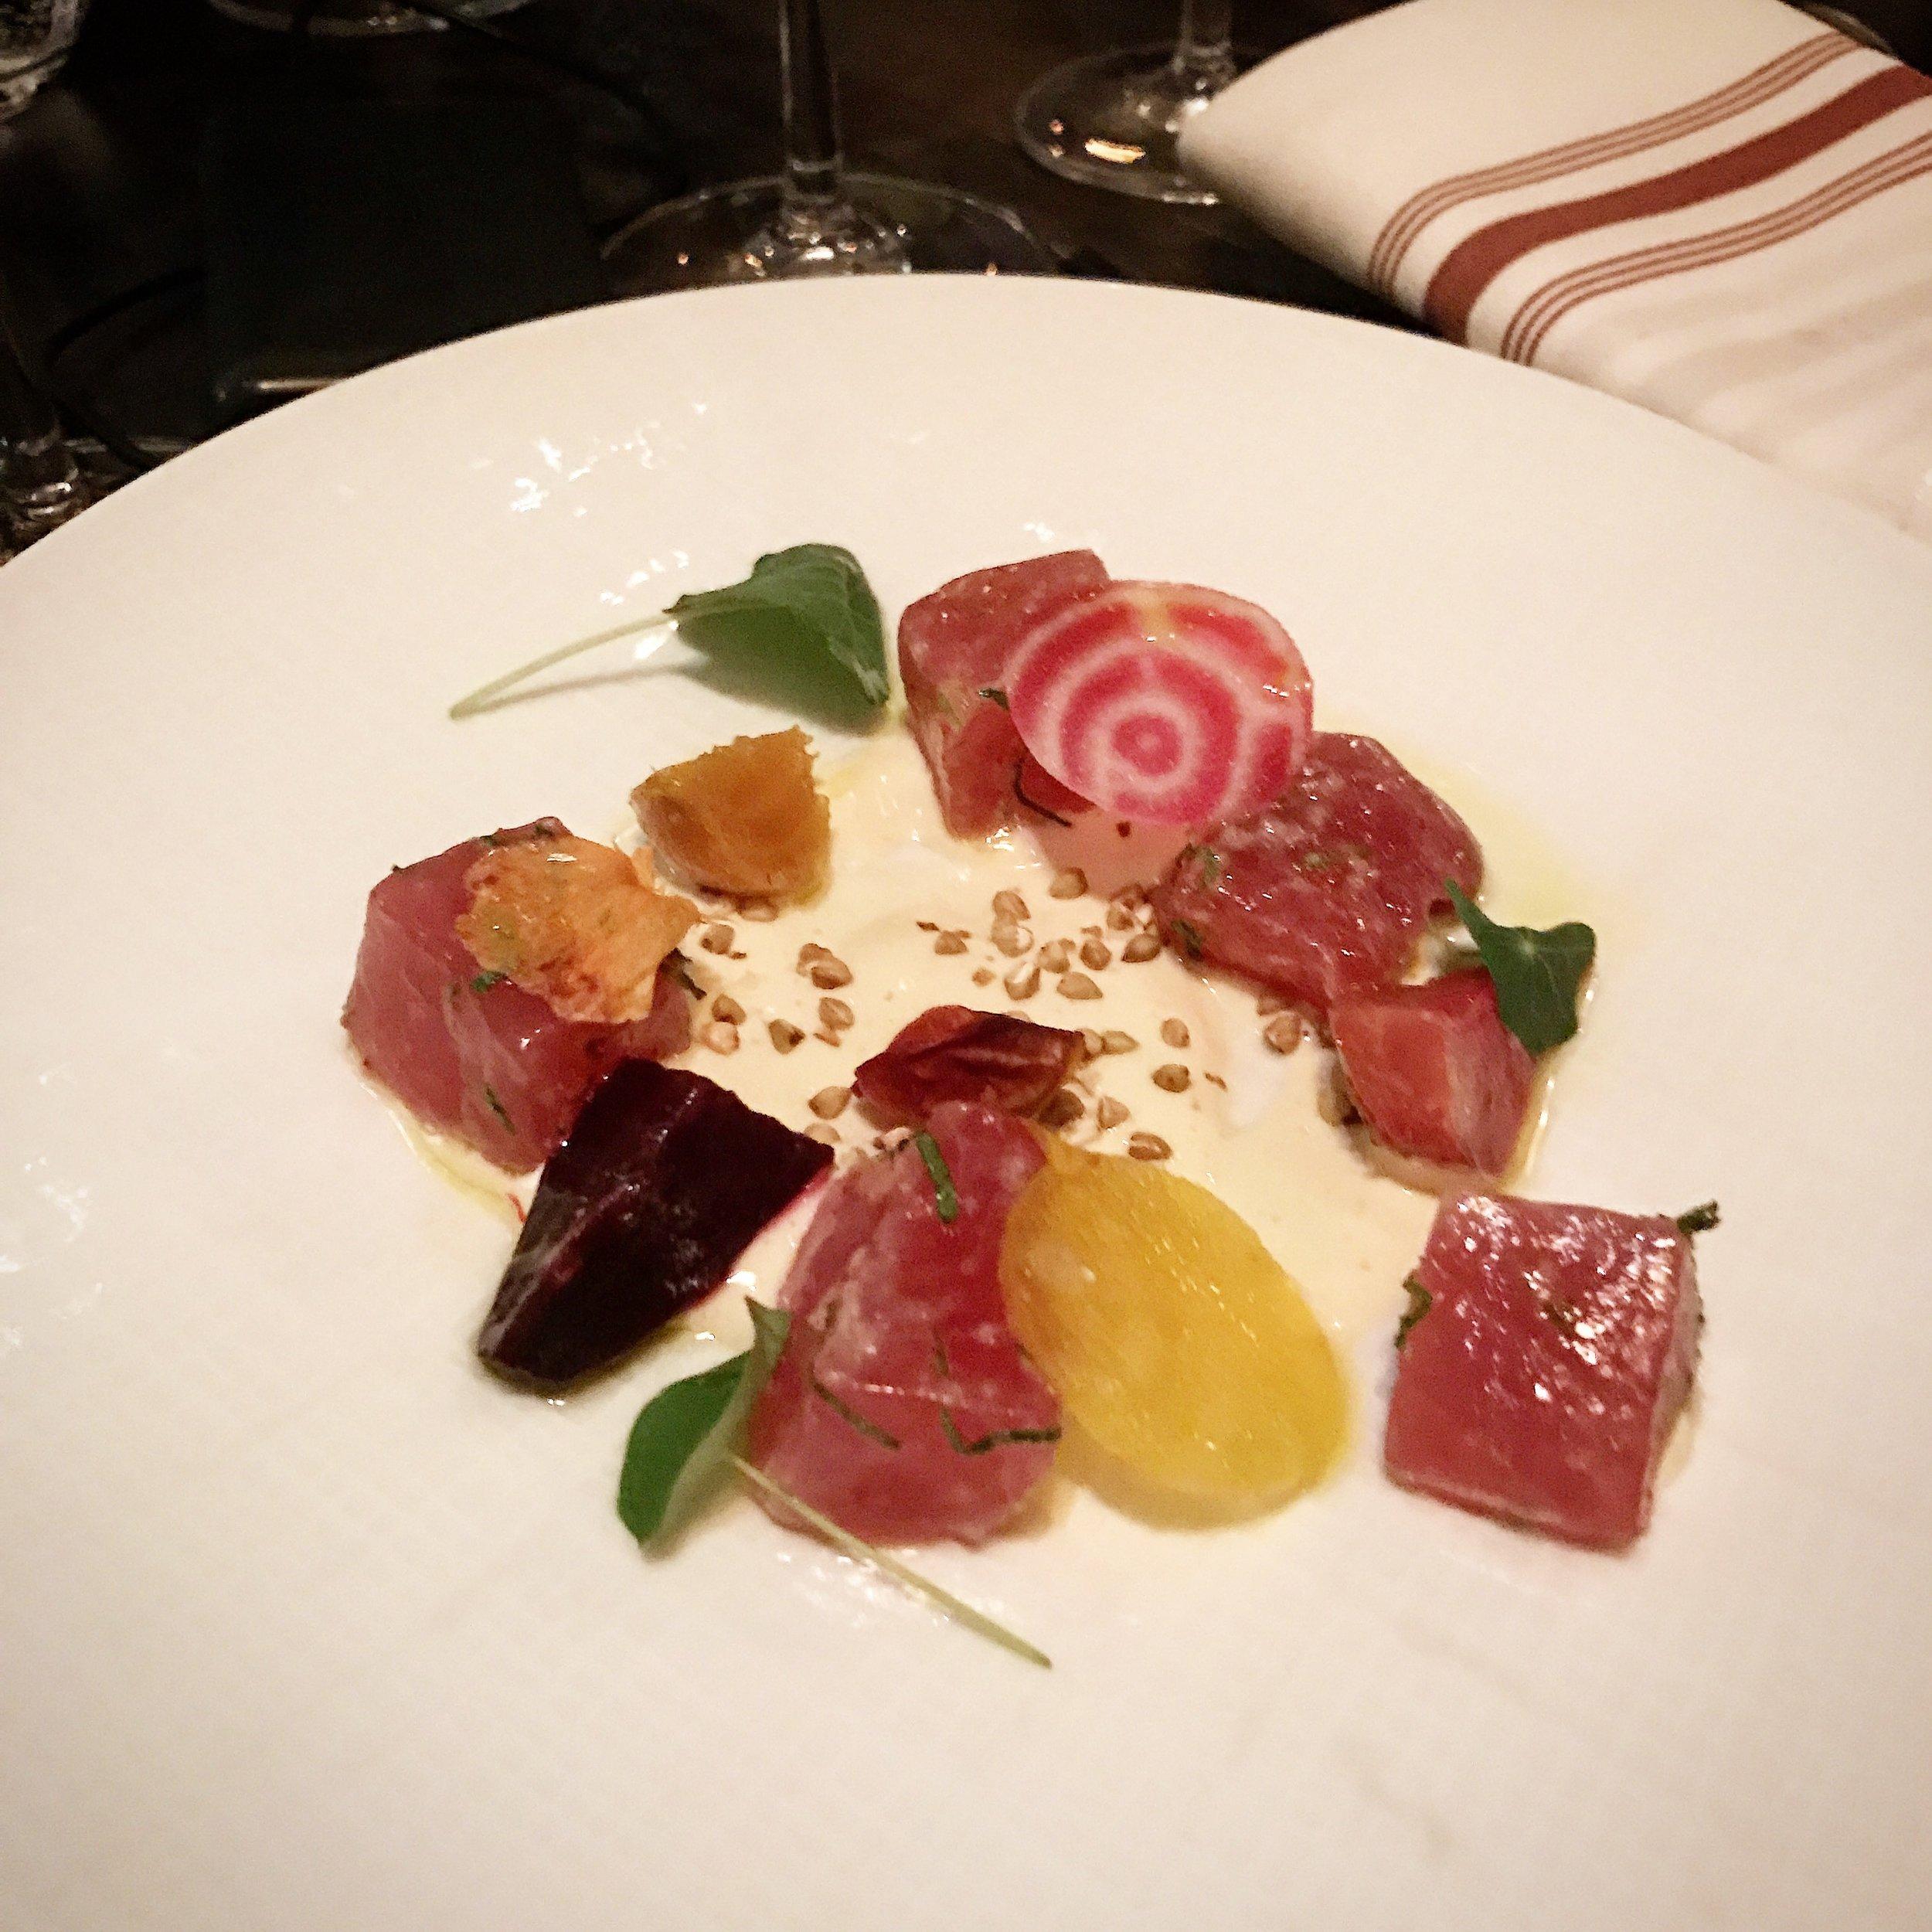 Racine's tuna crudo with citrus cream and beets